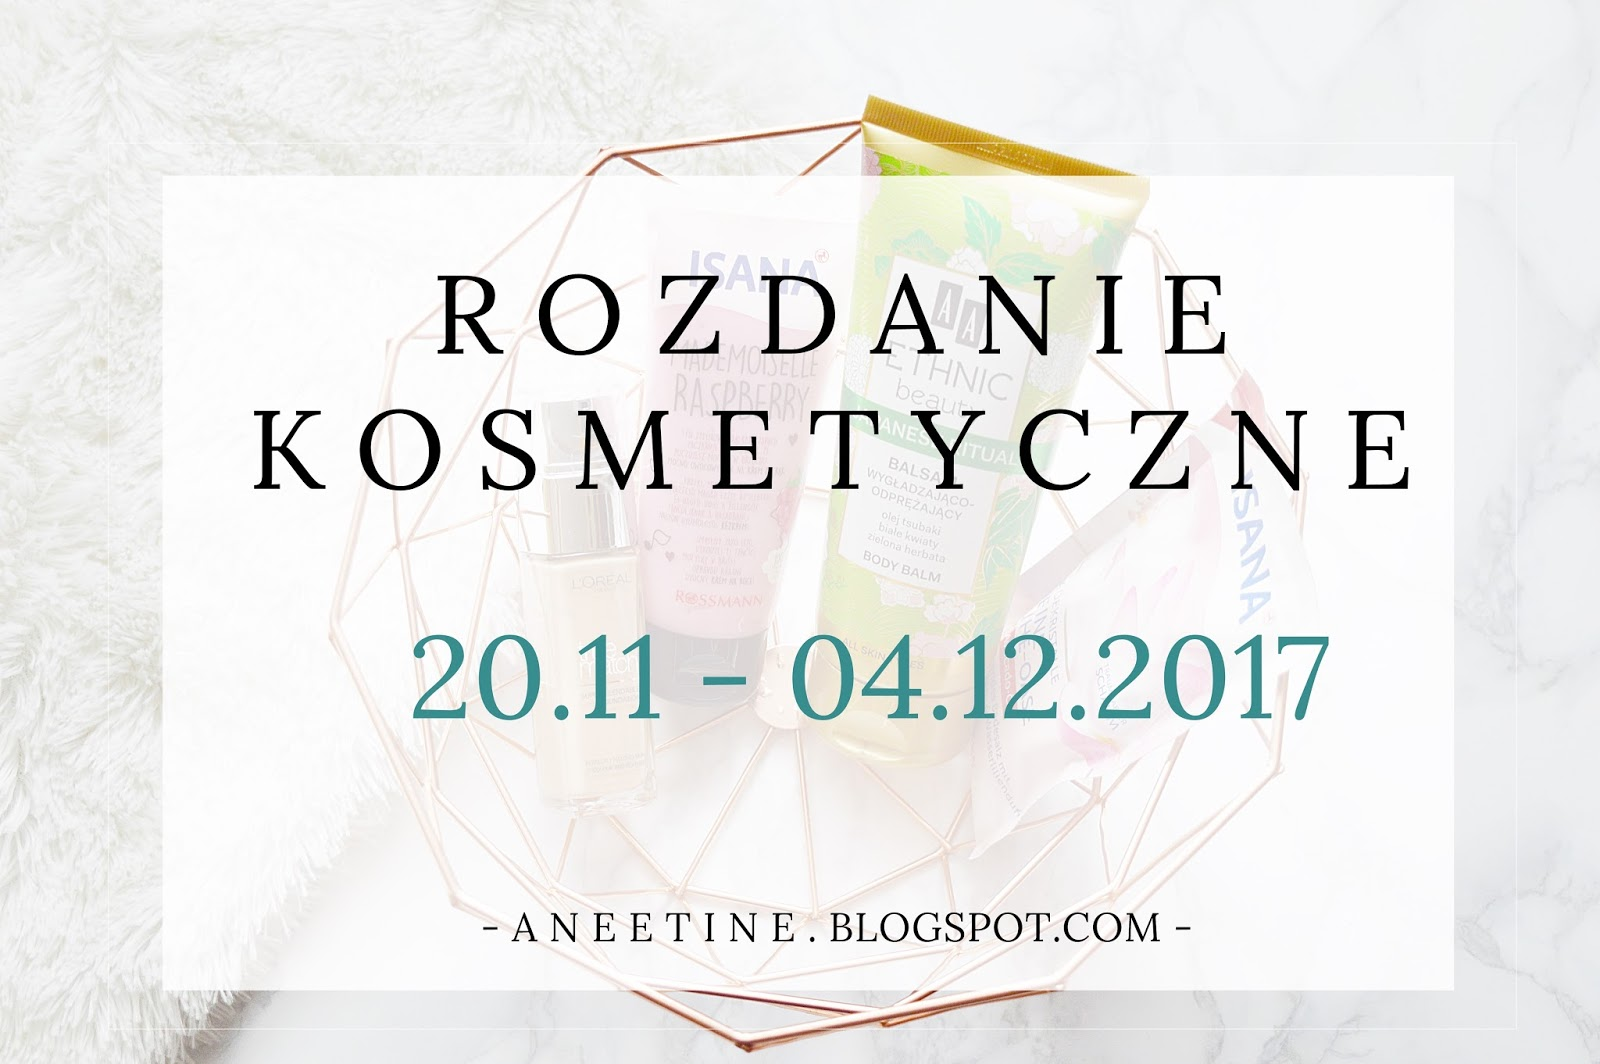 04.12.2017